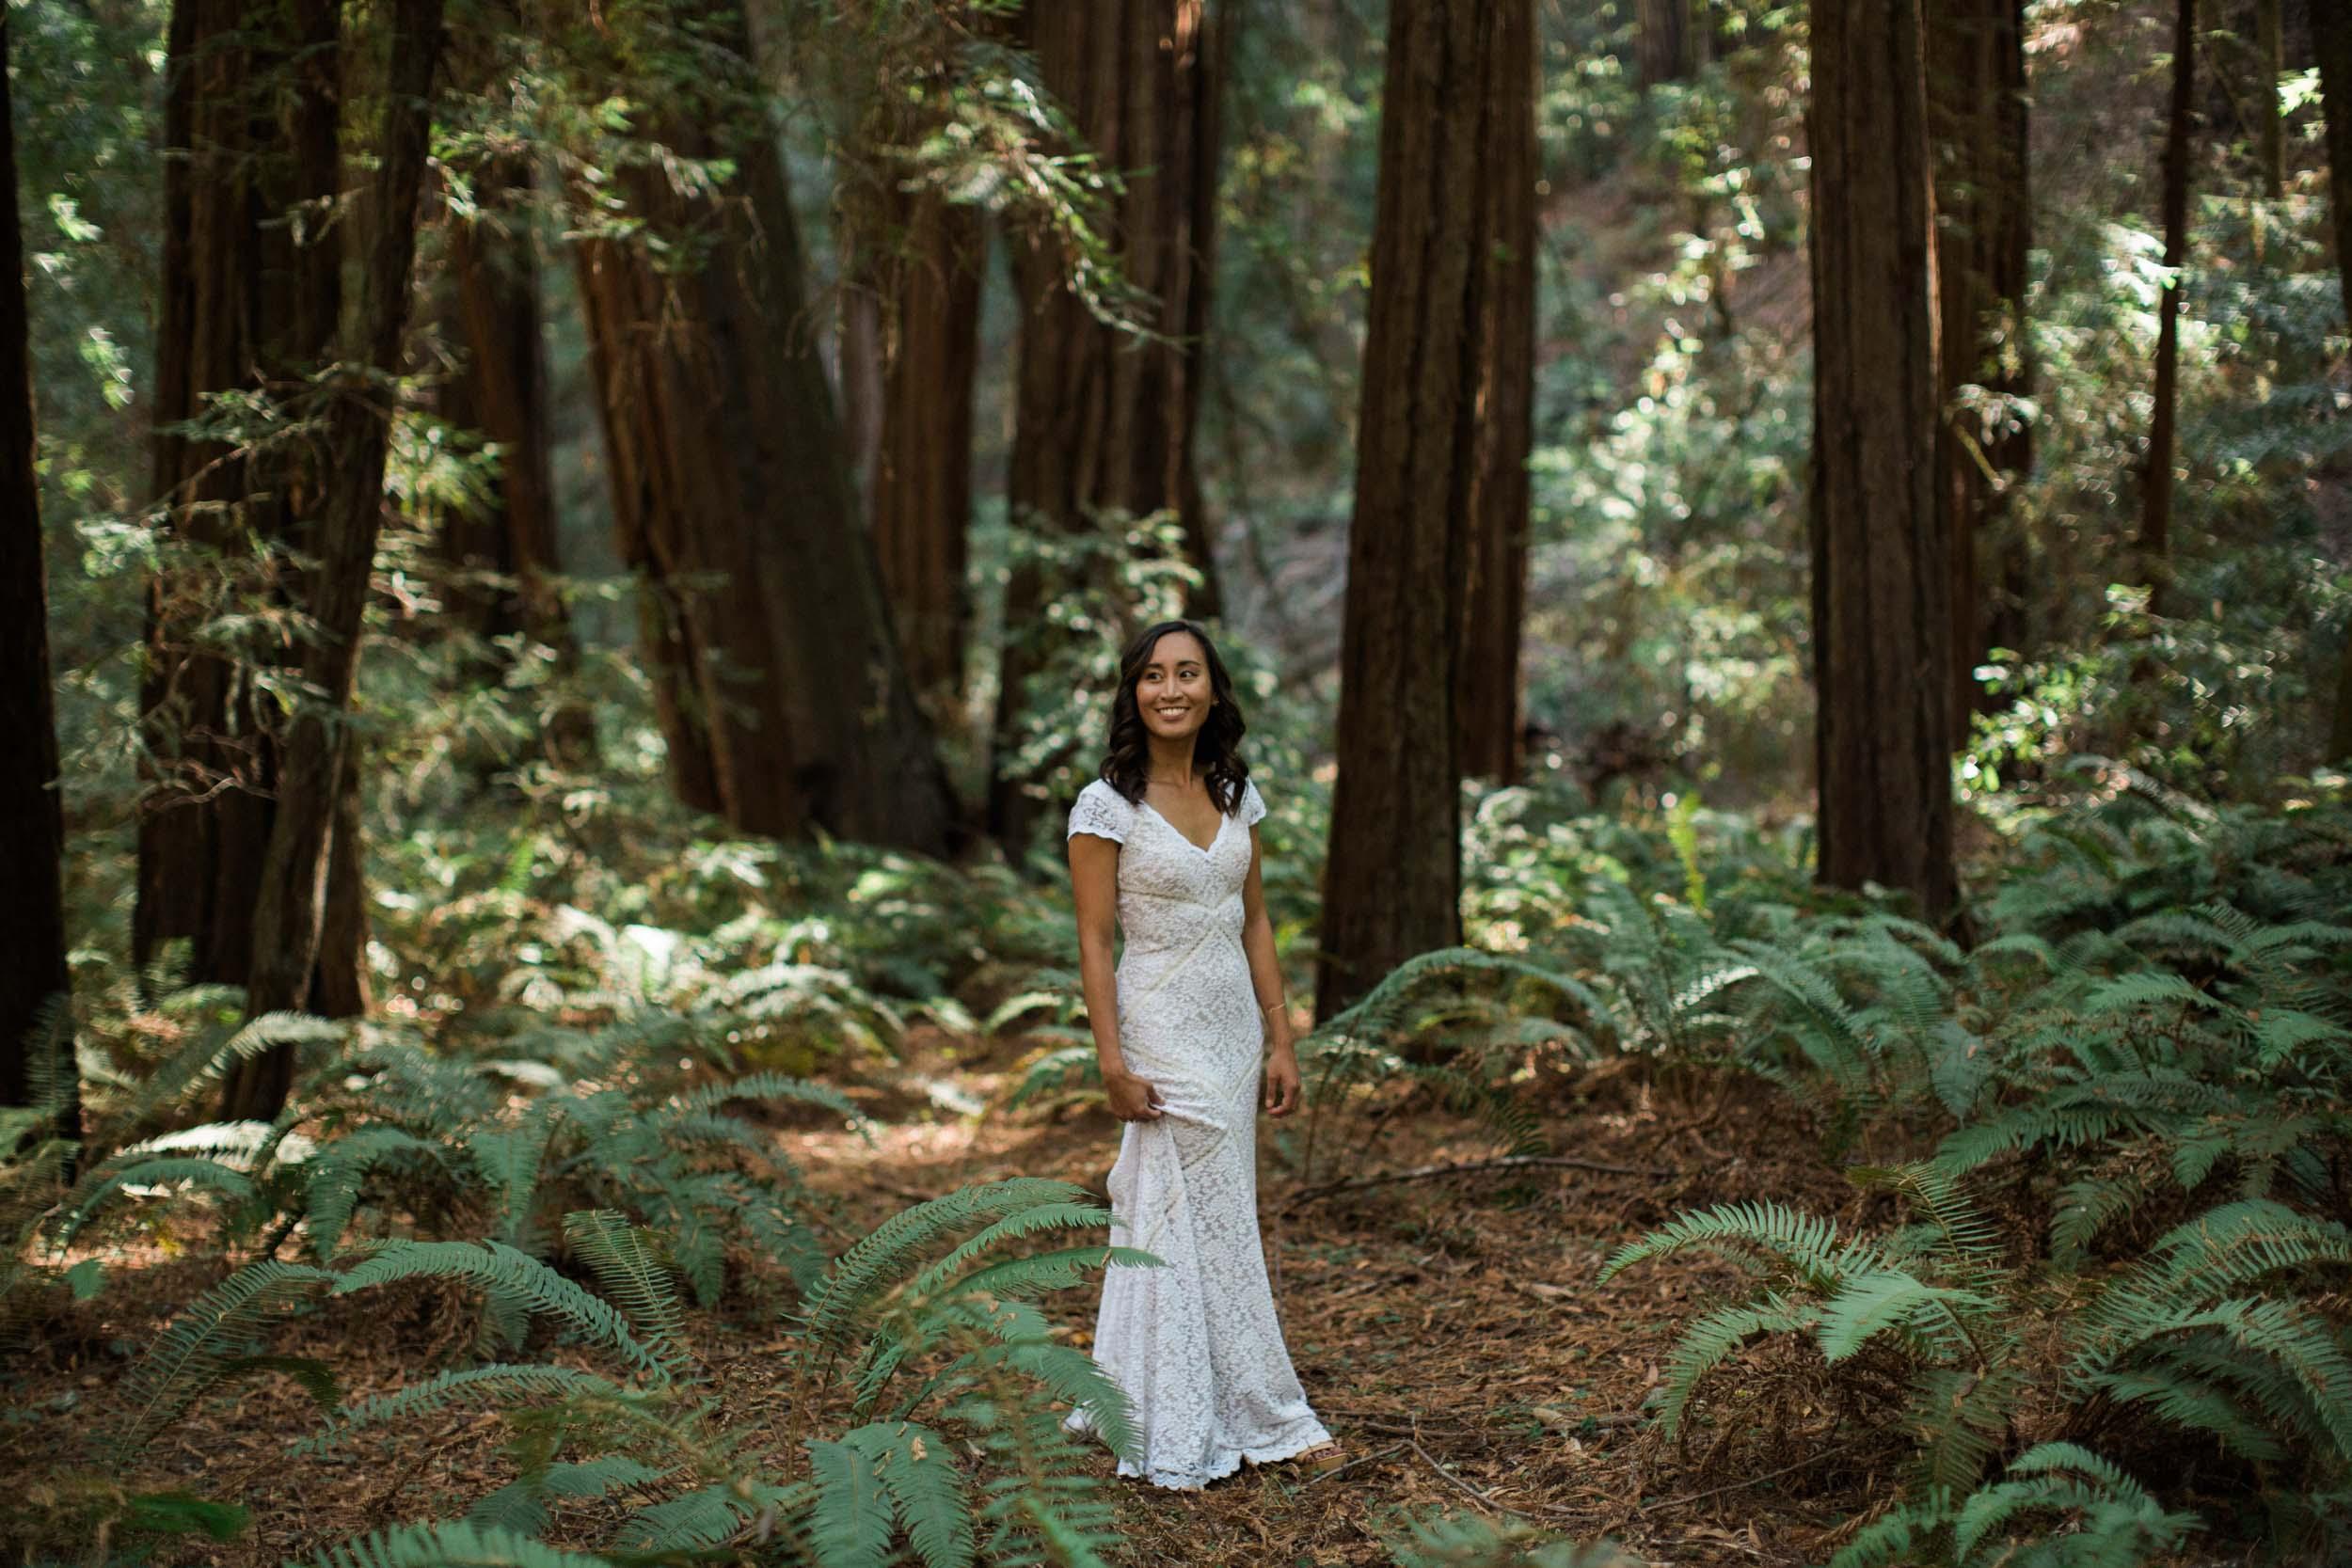 BKM-Photography-Russian-River-Wedding-Redwoods-Guerneville-California-Destination-Wedding-Photographer-0015.jpg